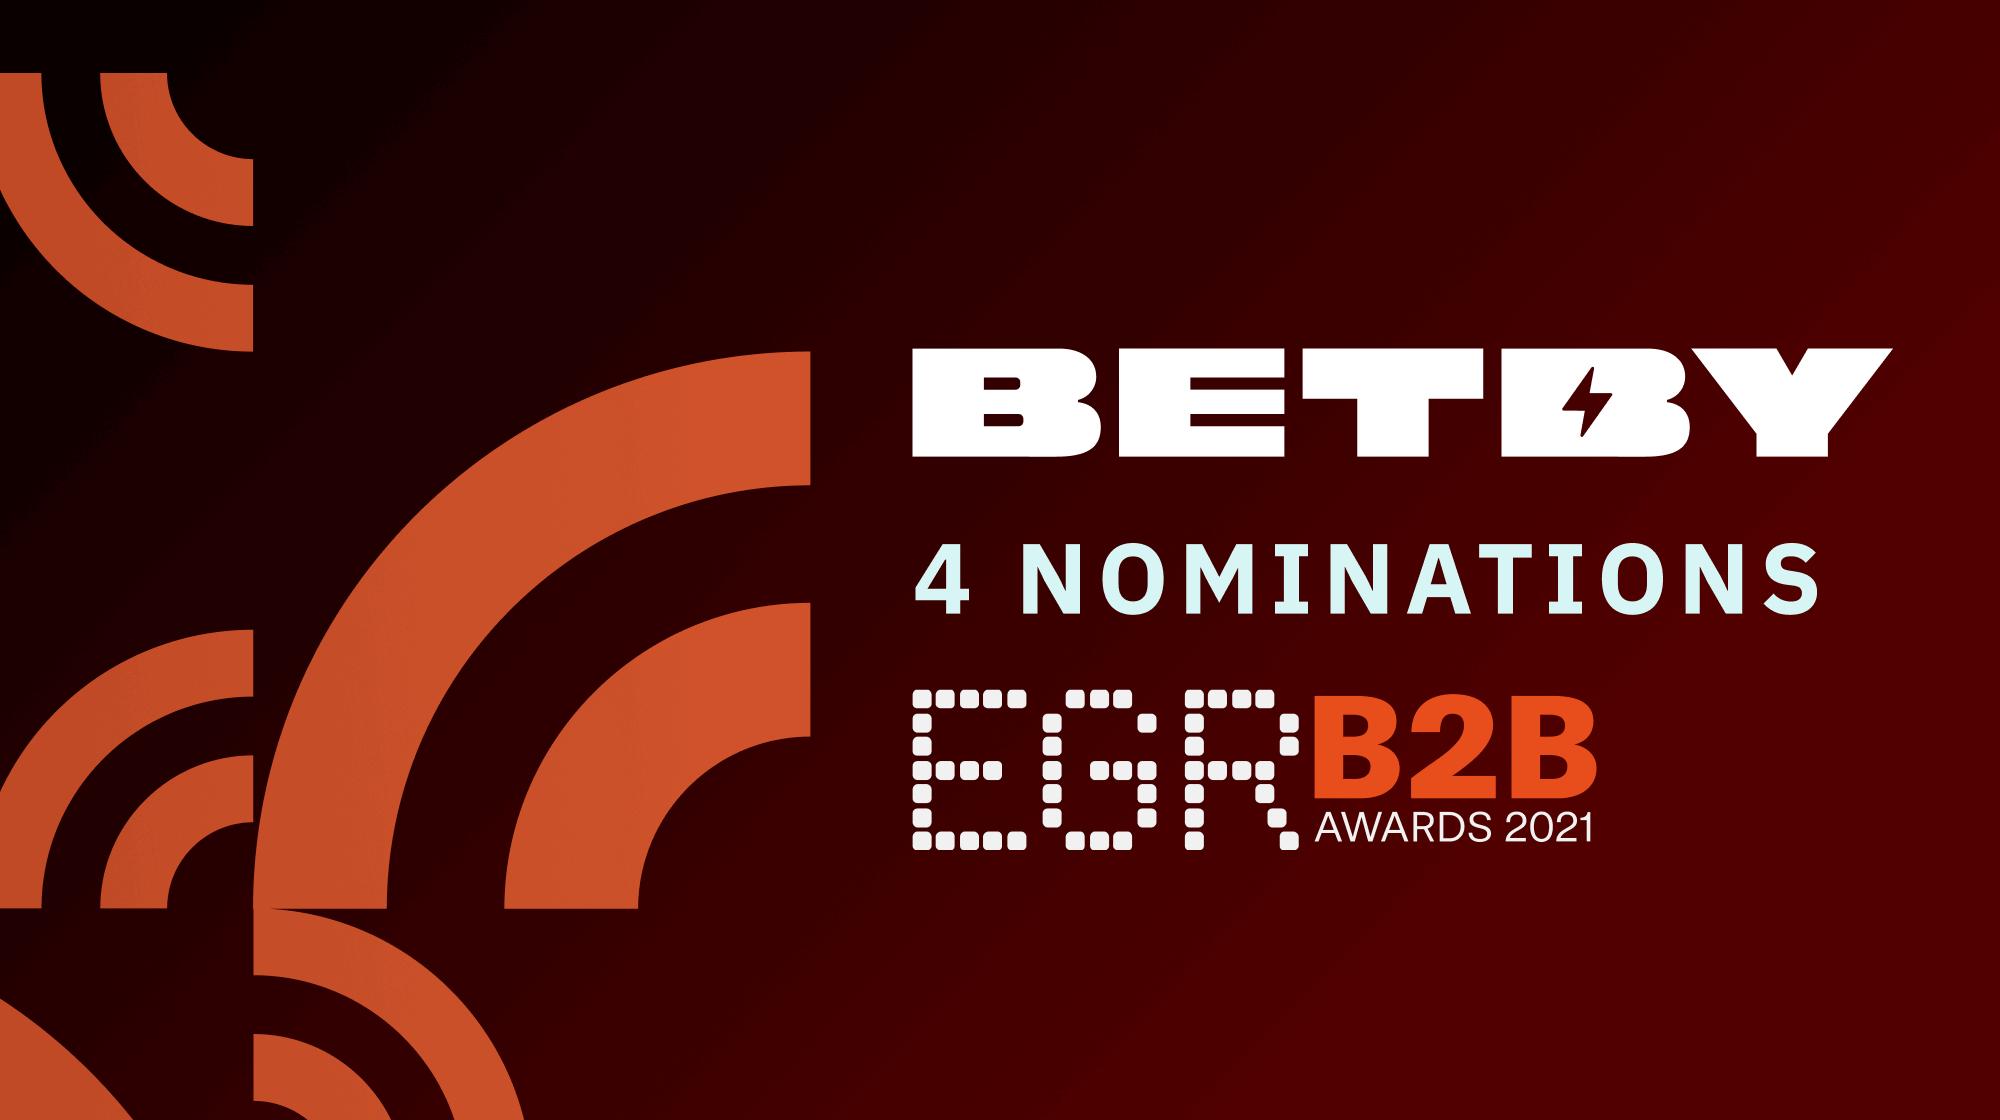 BETBY ENJOYS FOUR EGR B2B AWARD NOMINATIONS